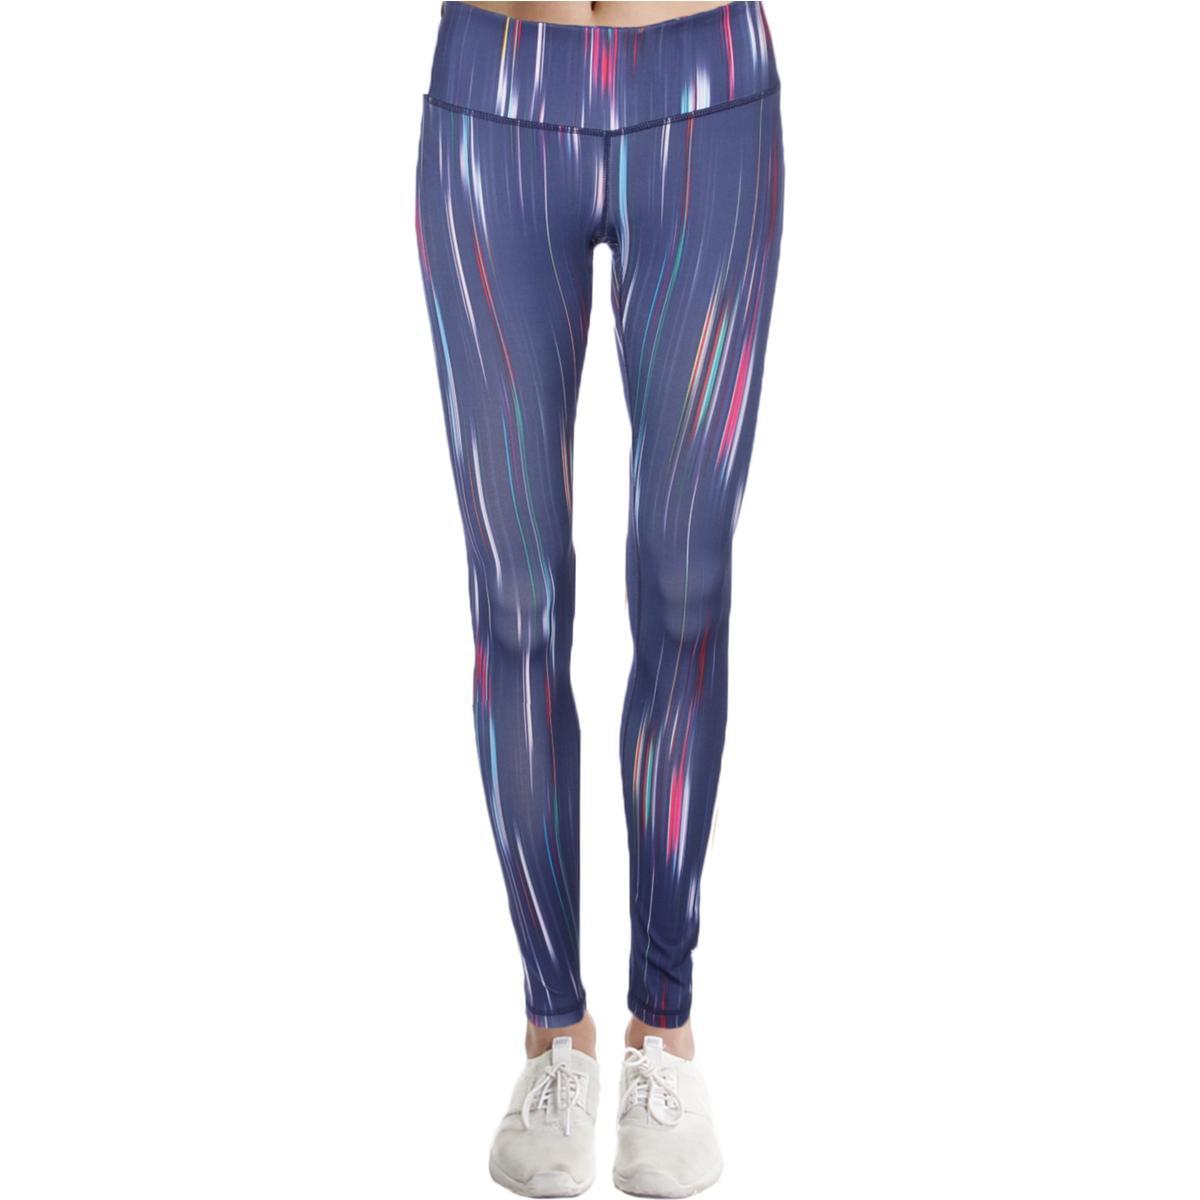 Reebok Women/'s Space Dye Tights